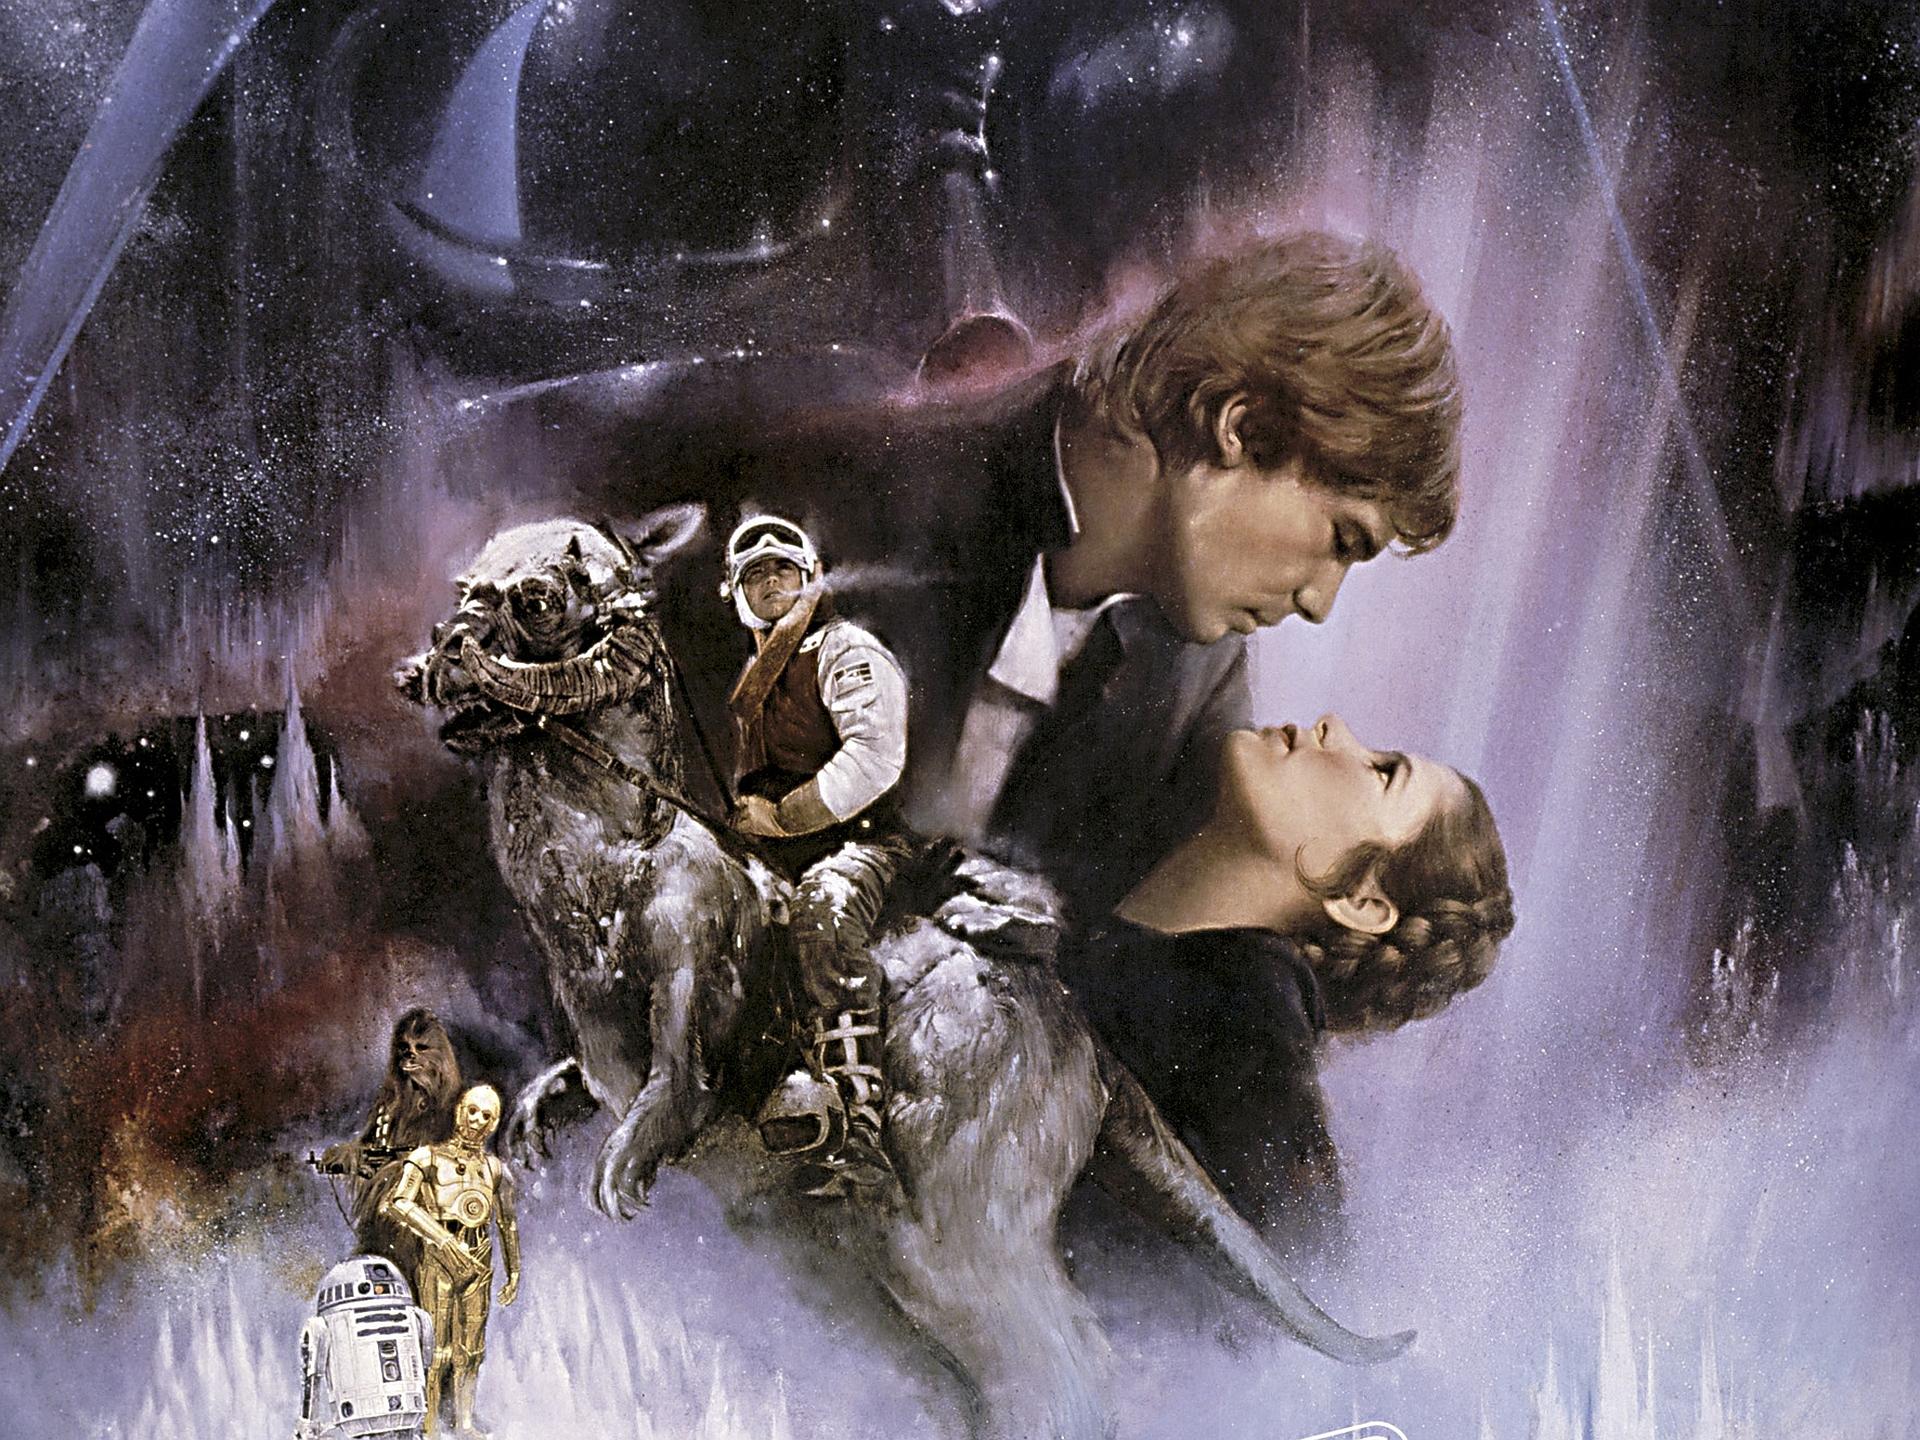 Star Wars Episode V The Empire Strikes Back Hd Wallpaper